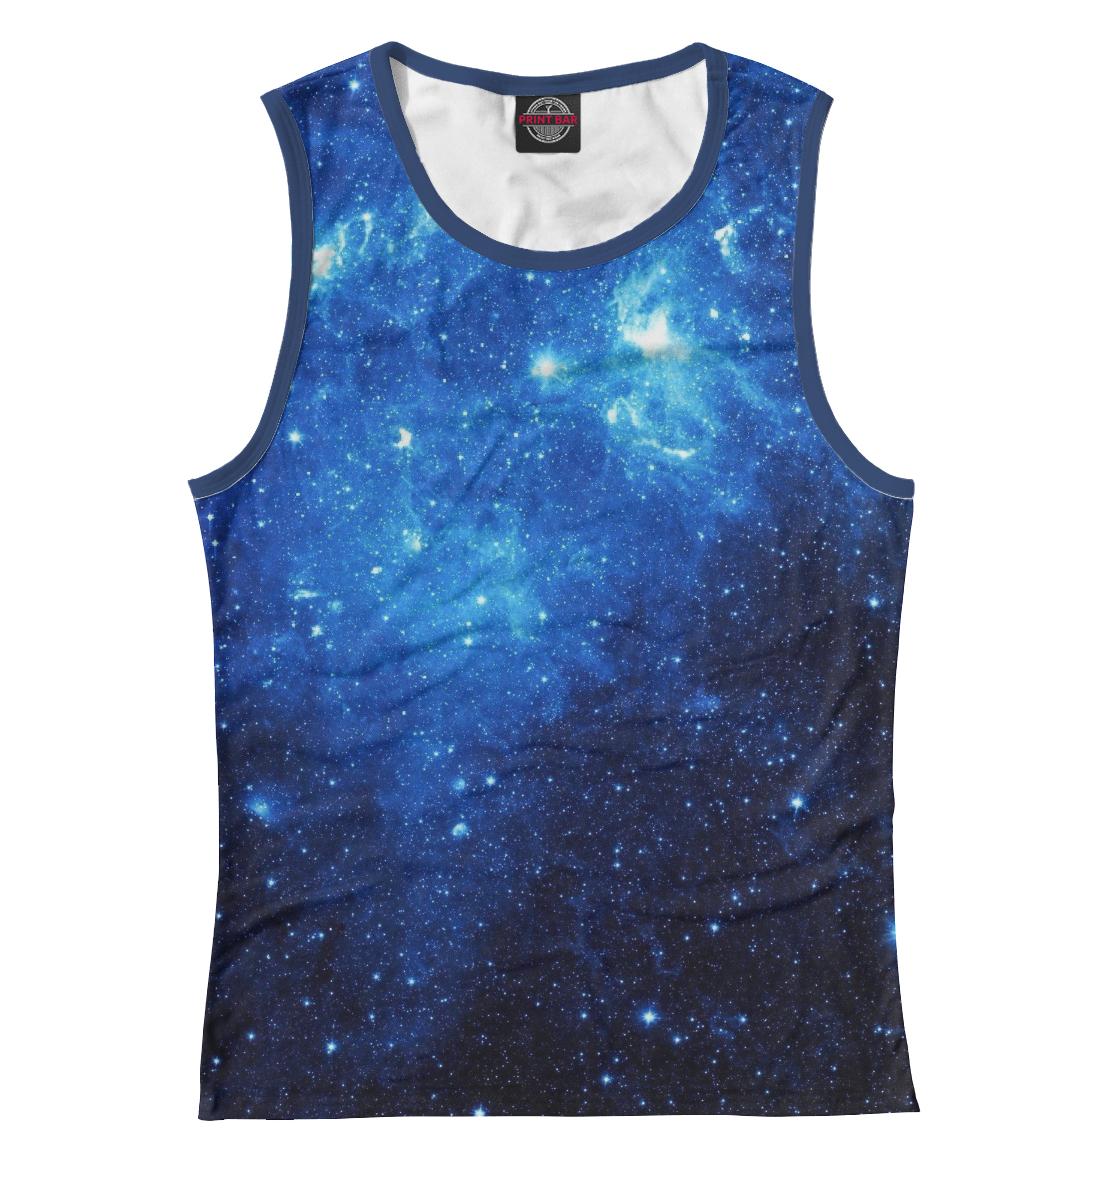 Купить Космический мороз, Printbar, Майки, APD-379351-may-1